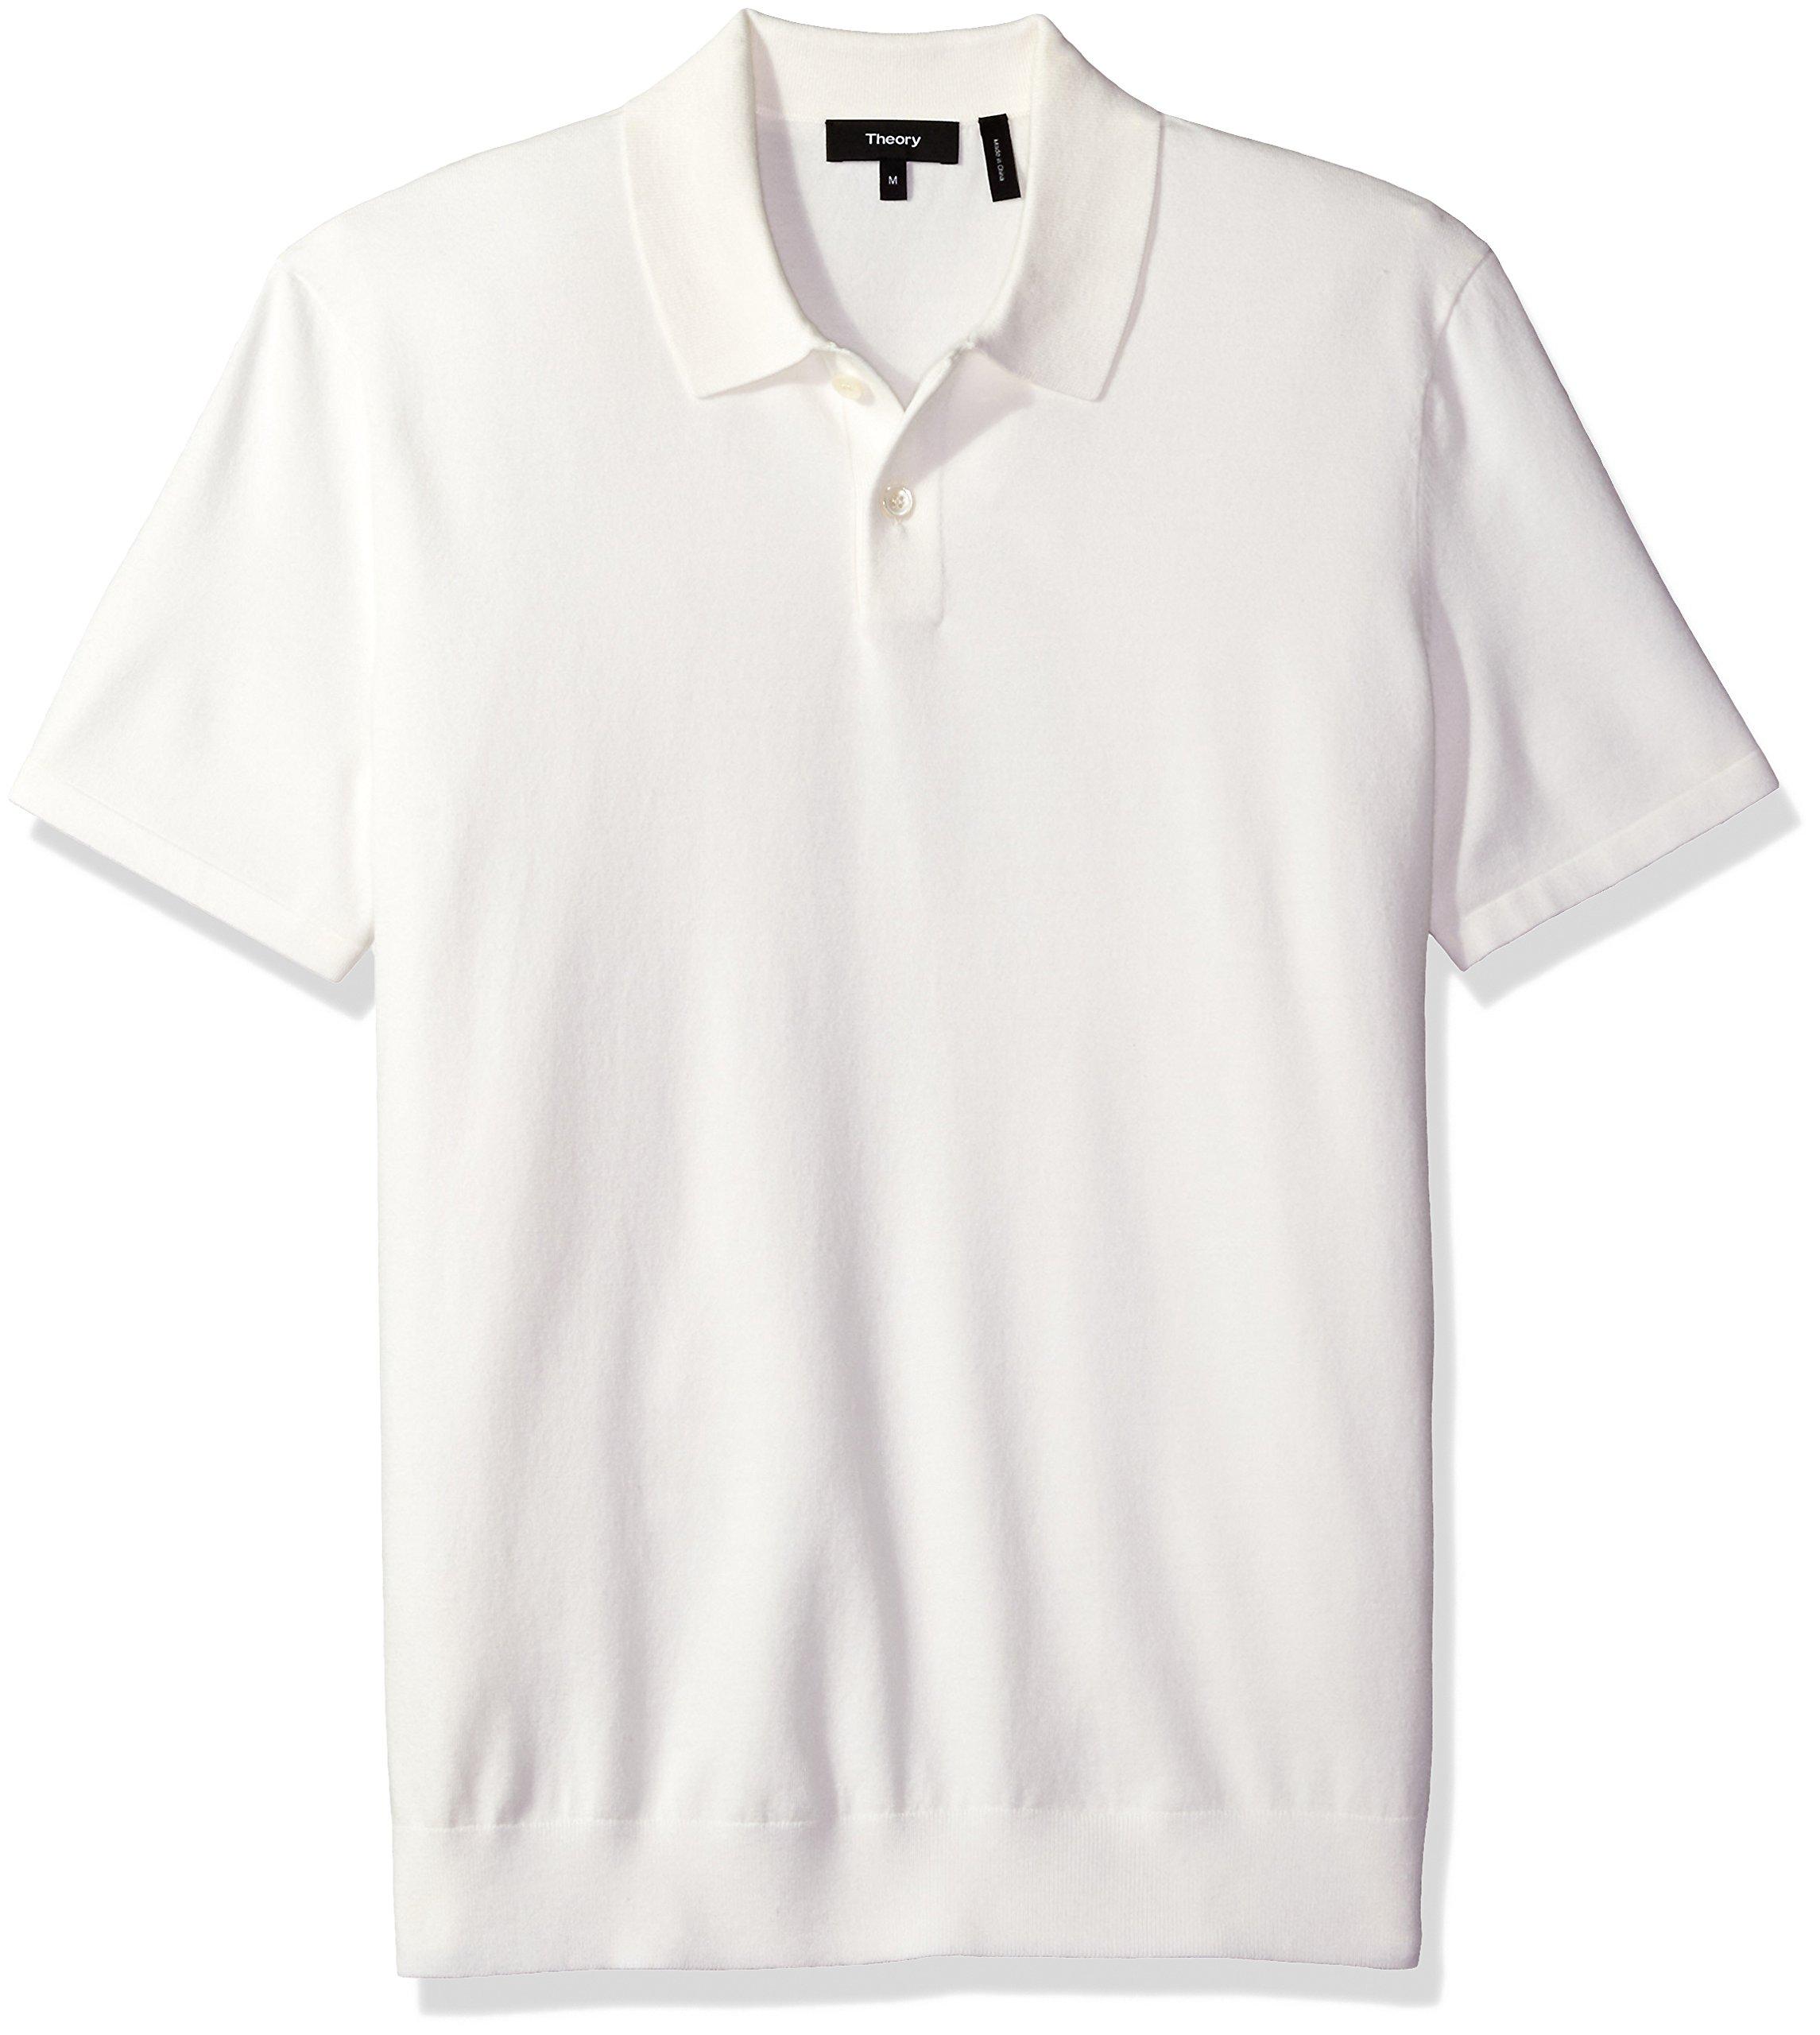 Theory Men's Goris Pl Fine Bilen Short Sleeve Polo, White, Small